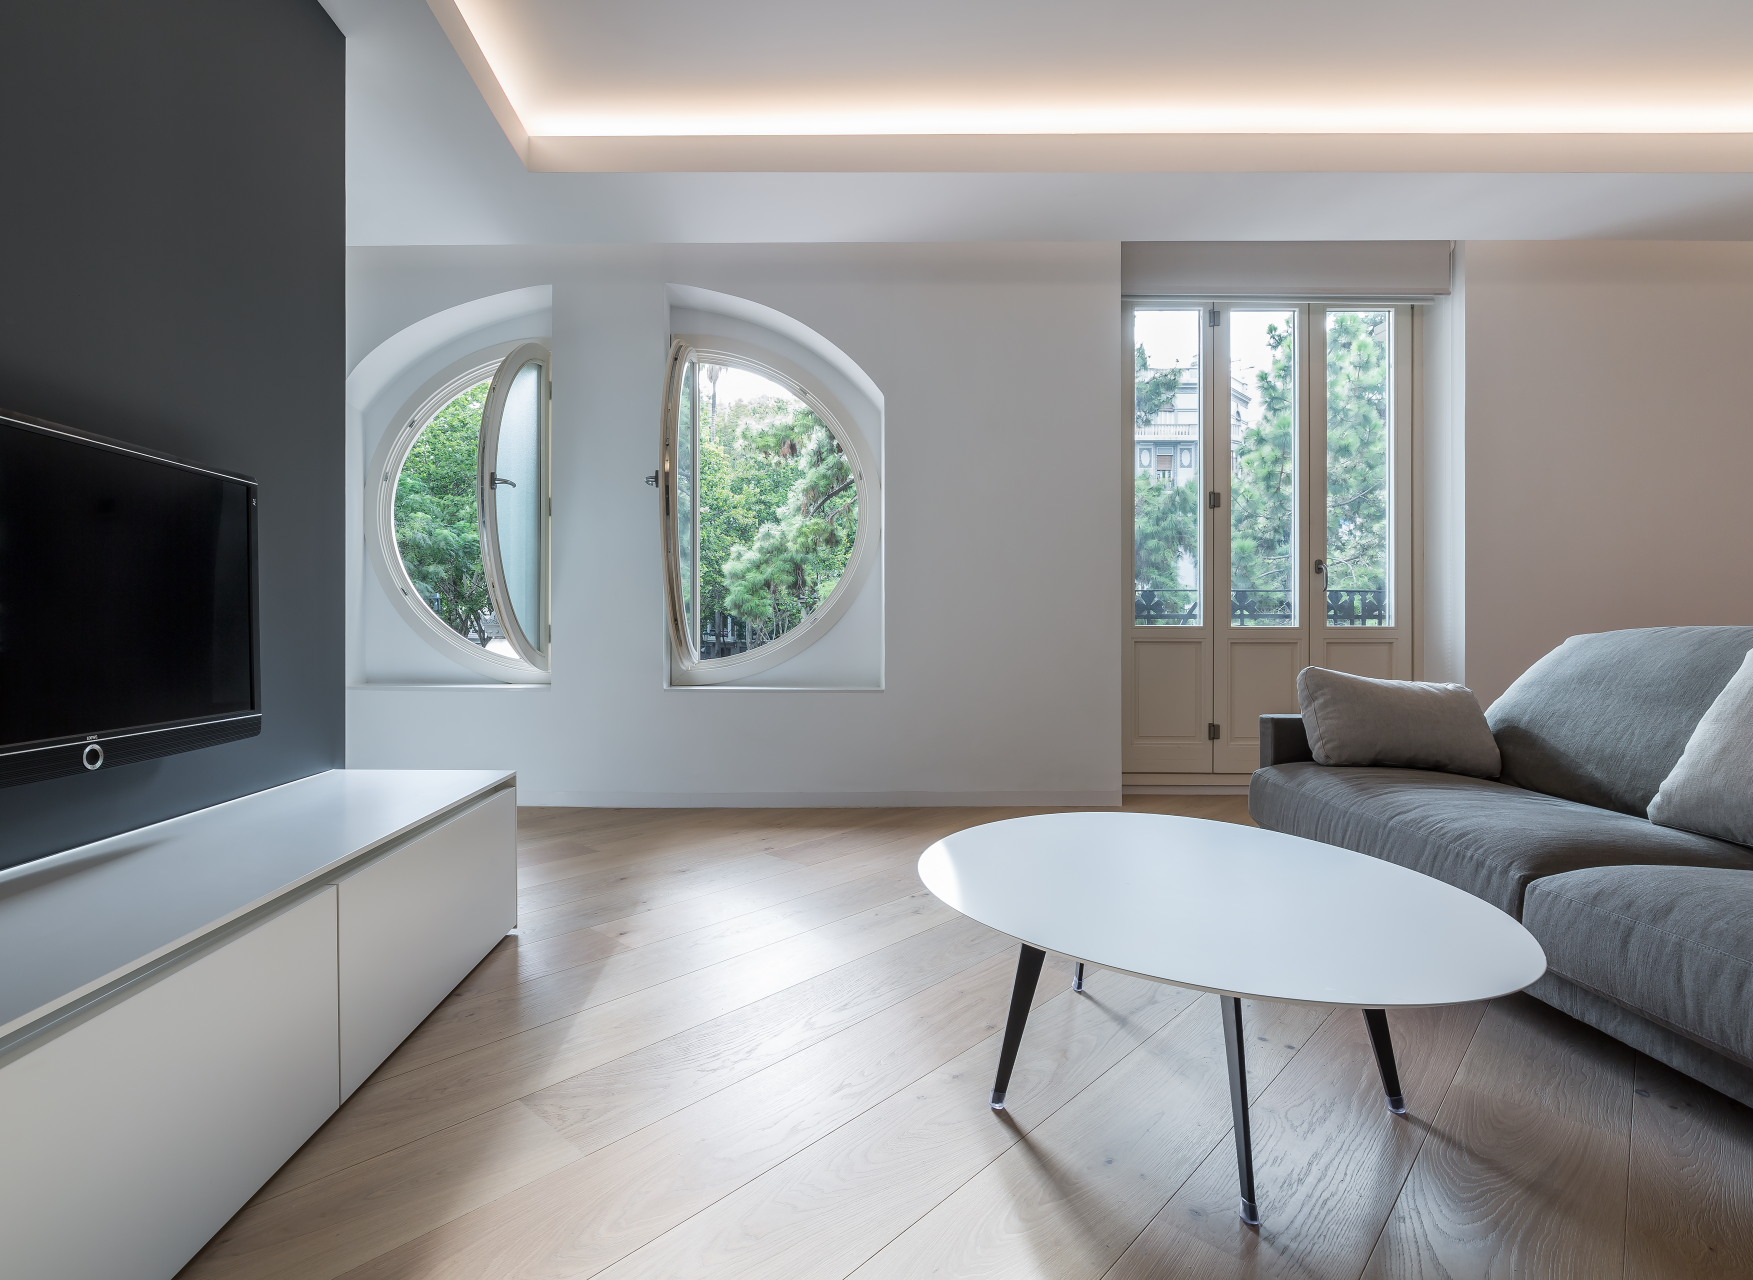 fotografia-arquitectura-interiorismo-valencia-german-cabo-gallardo-llopis-bfm-edificatoria-turia02 (3)